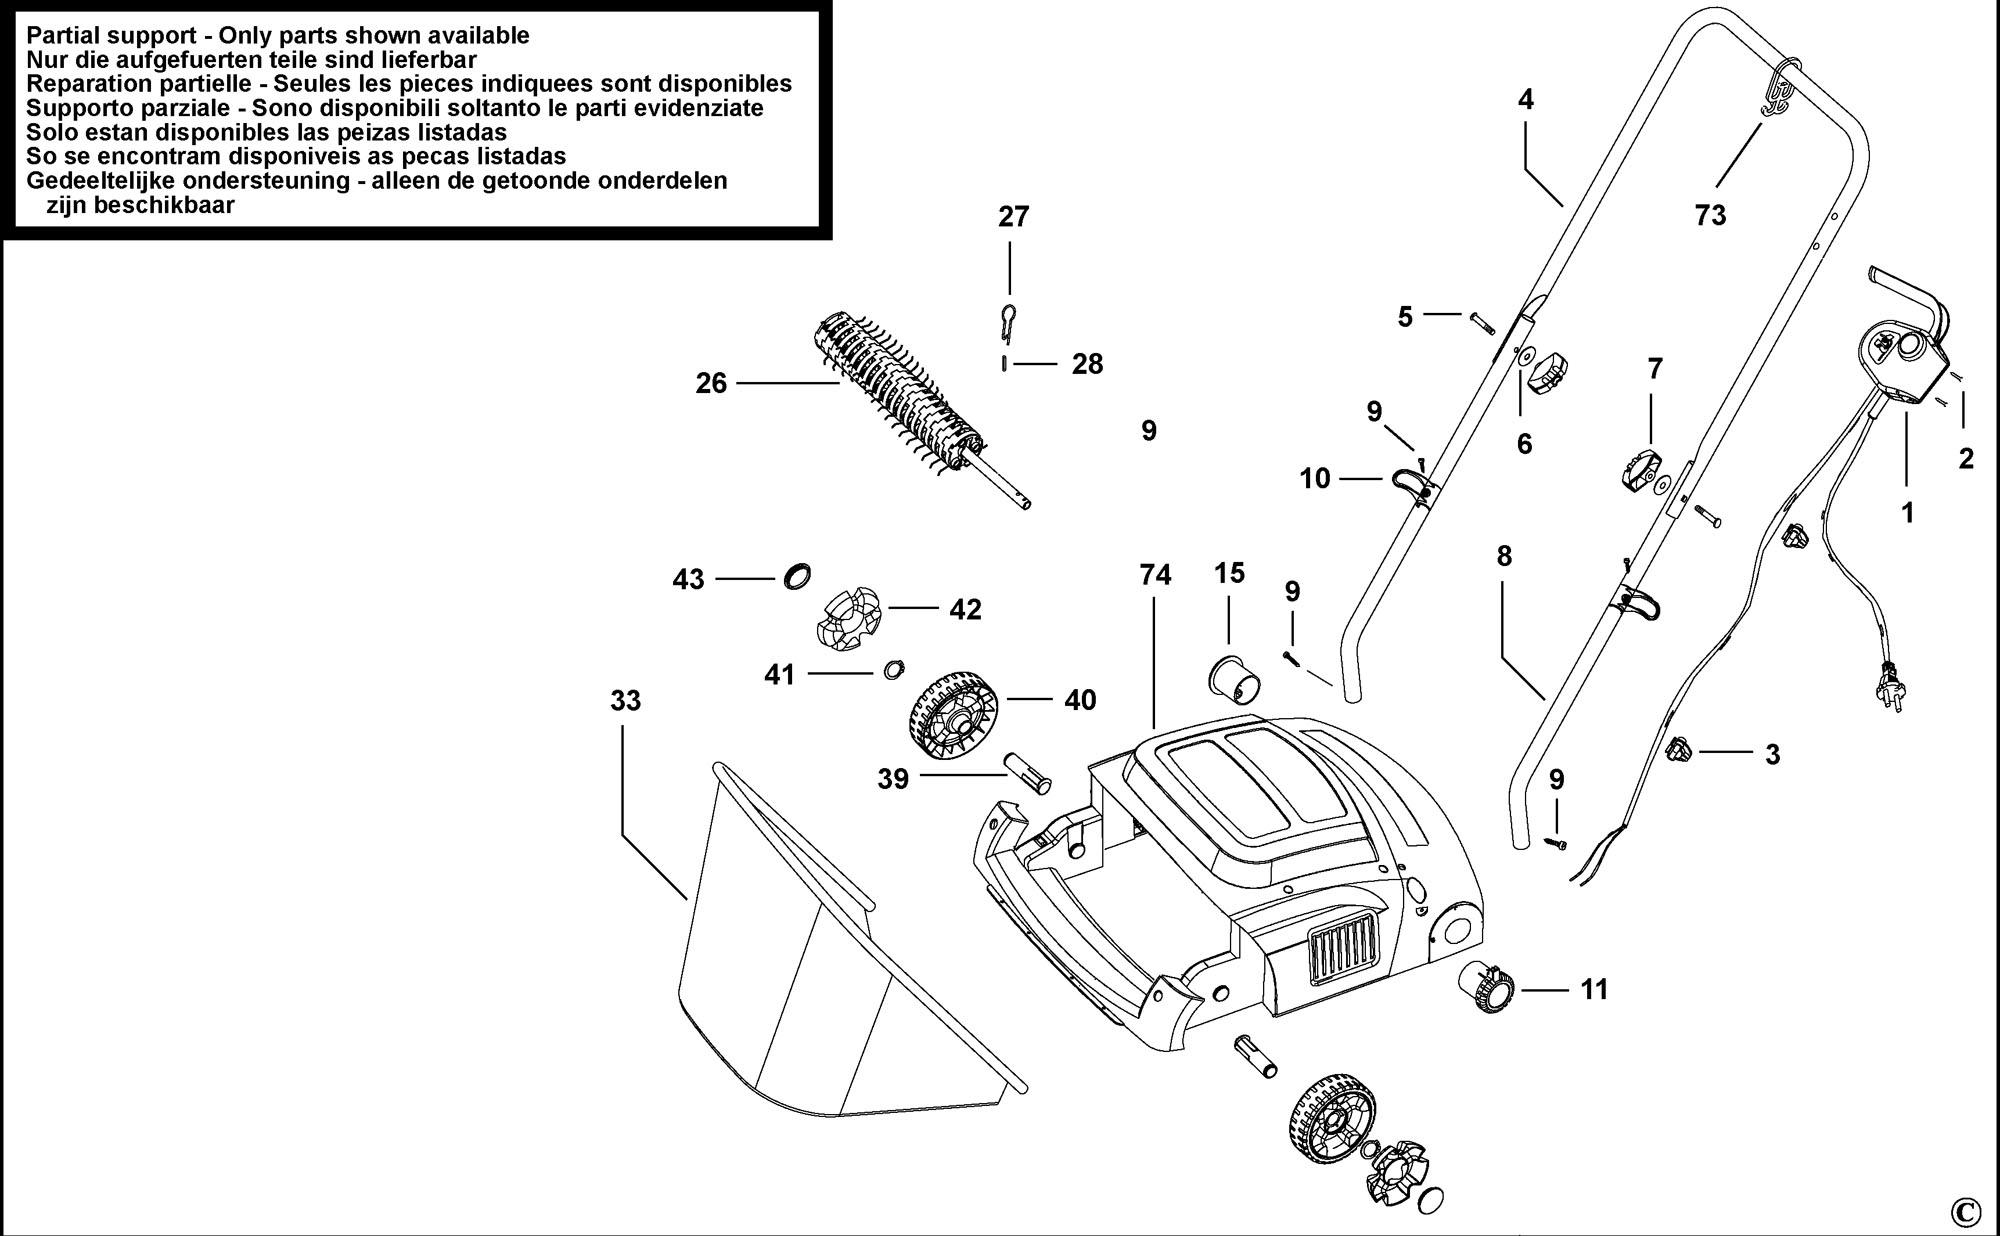 Spares for Black & Decker Gd300 Lawnraker (type 1) SPARE